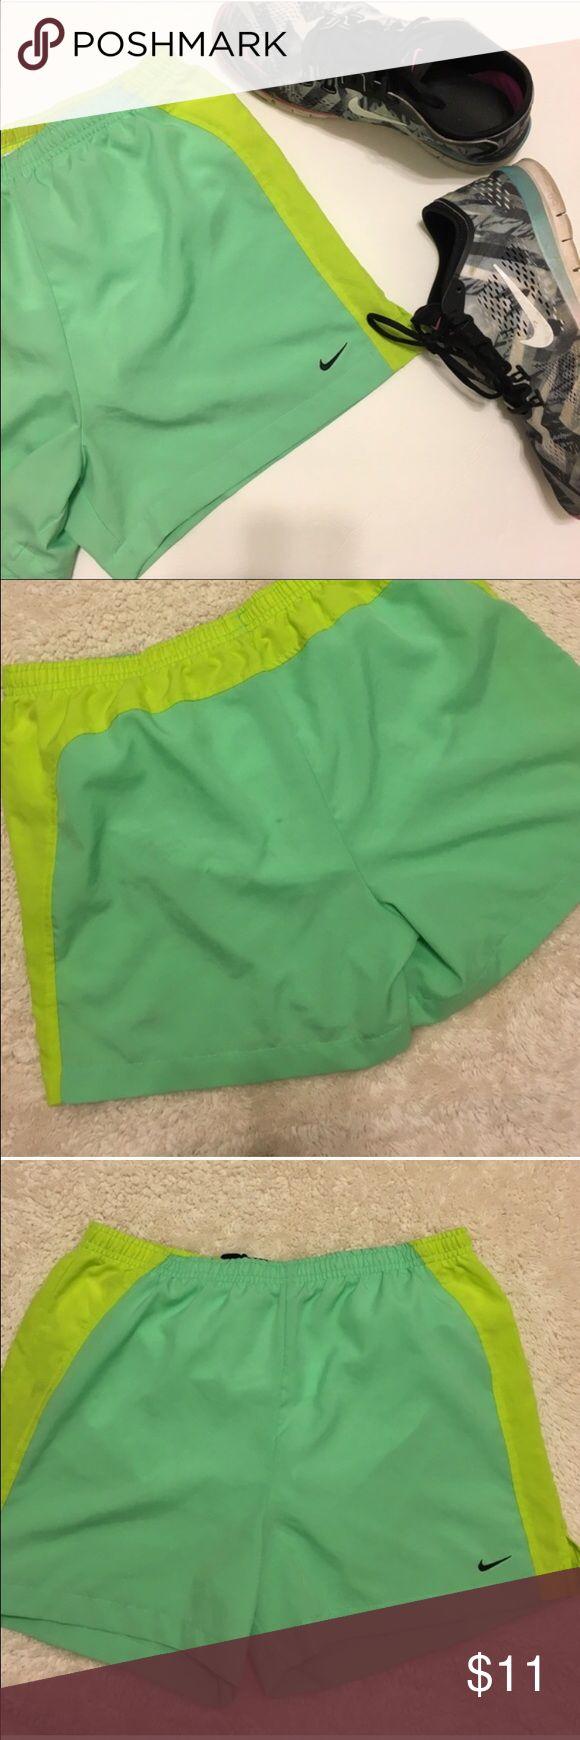 Nike Shorts Nike Green Shorts With Mesh Lining Size Women's Large Elastic Waist small stain Nike Shorts